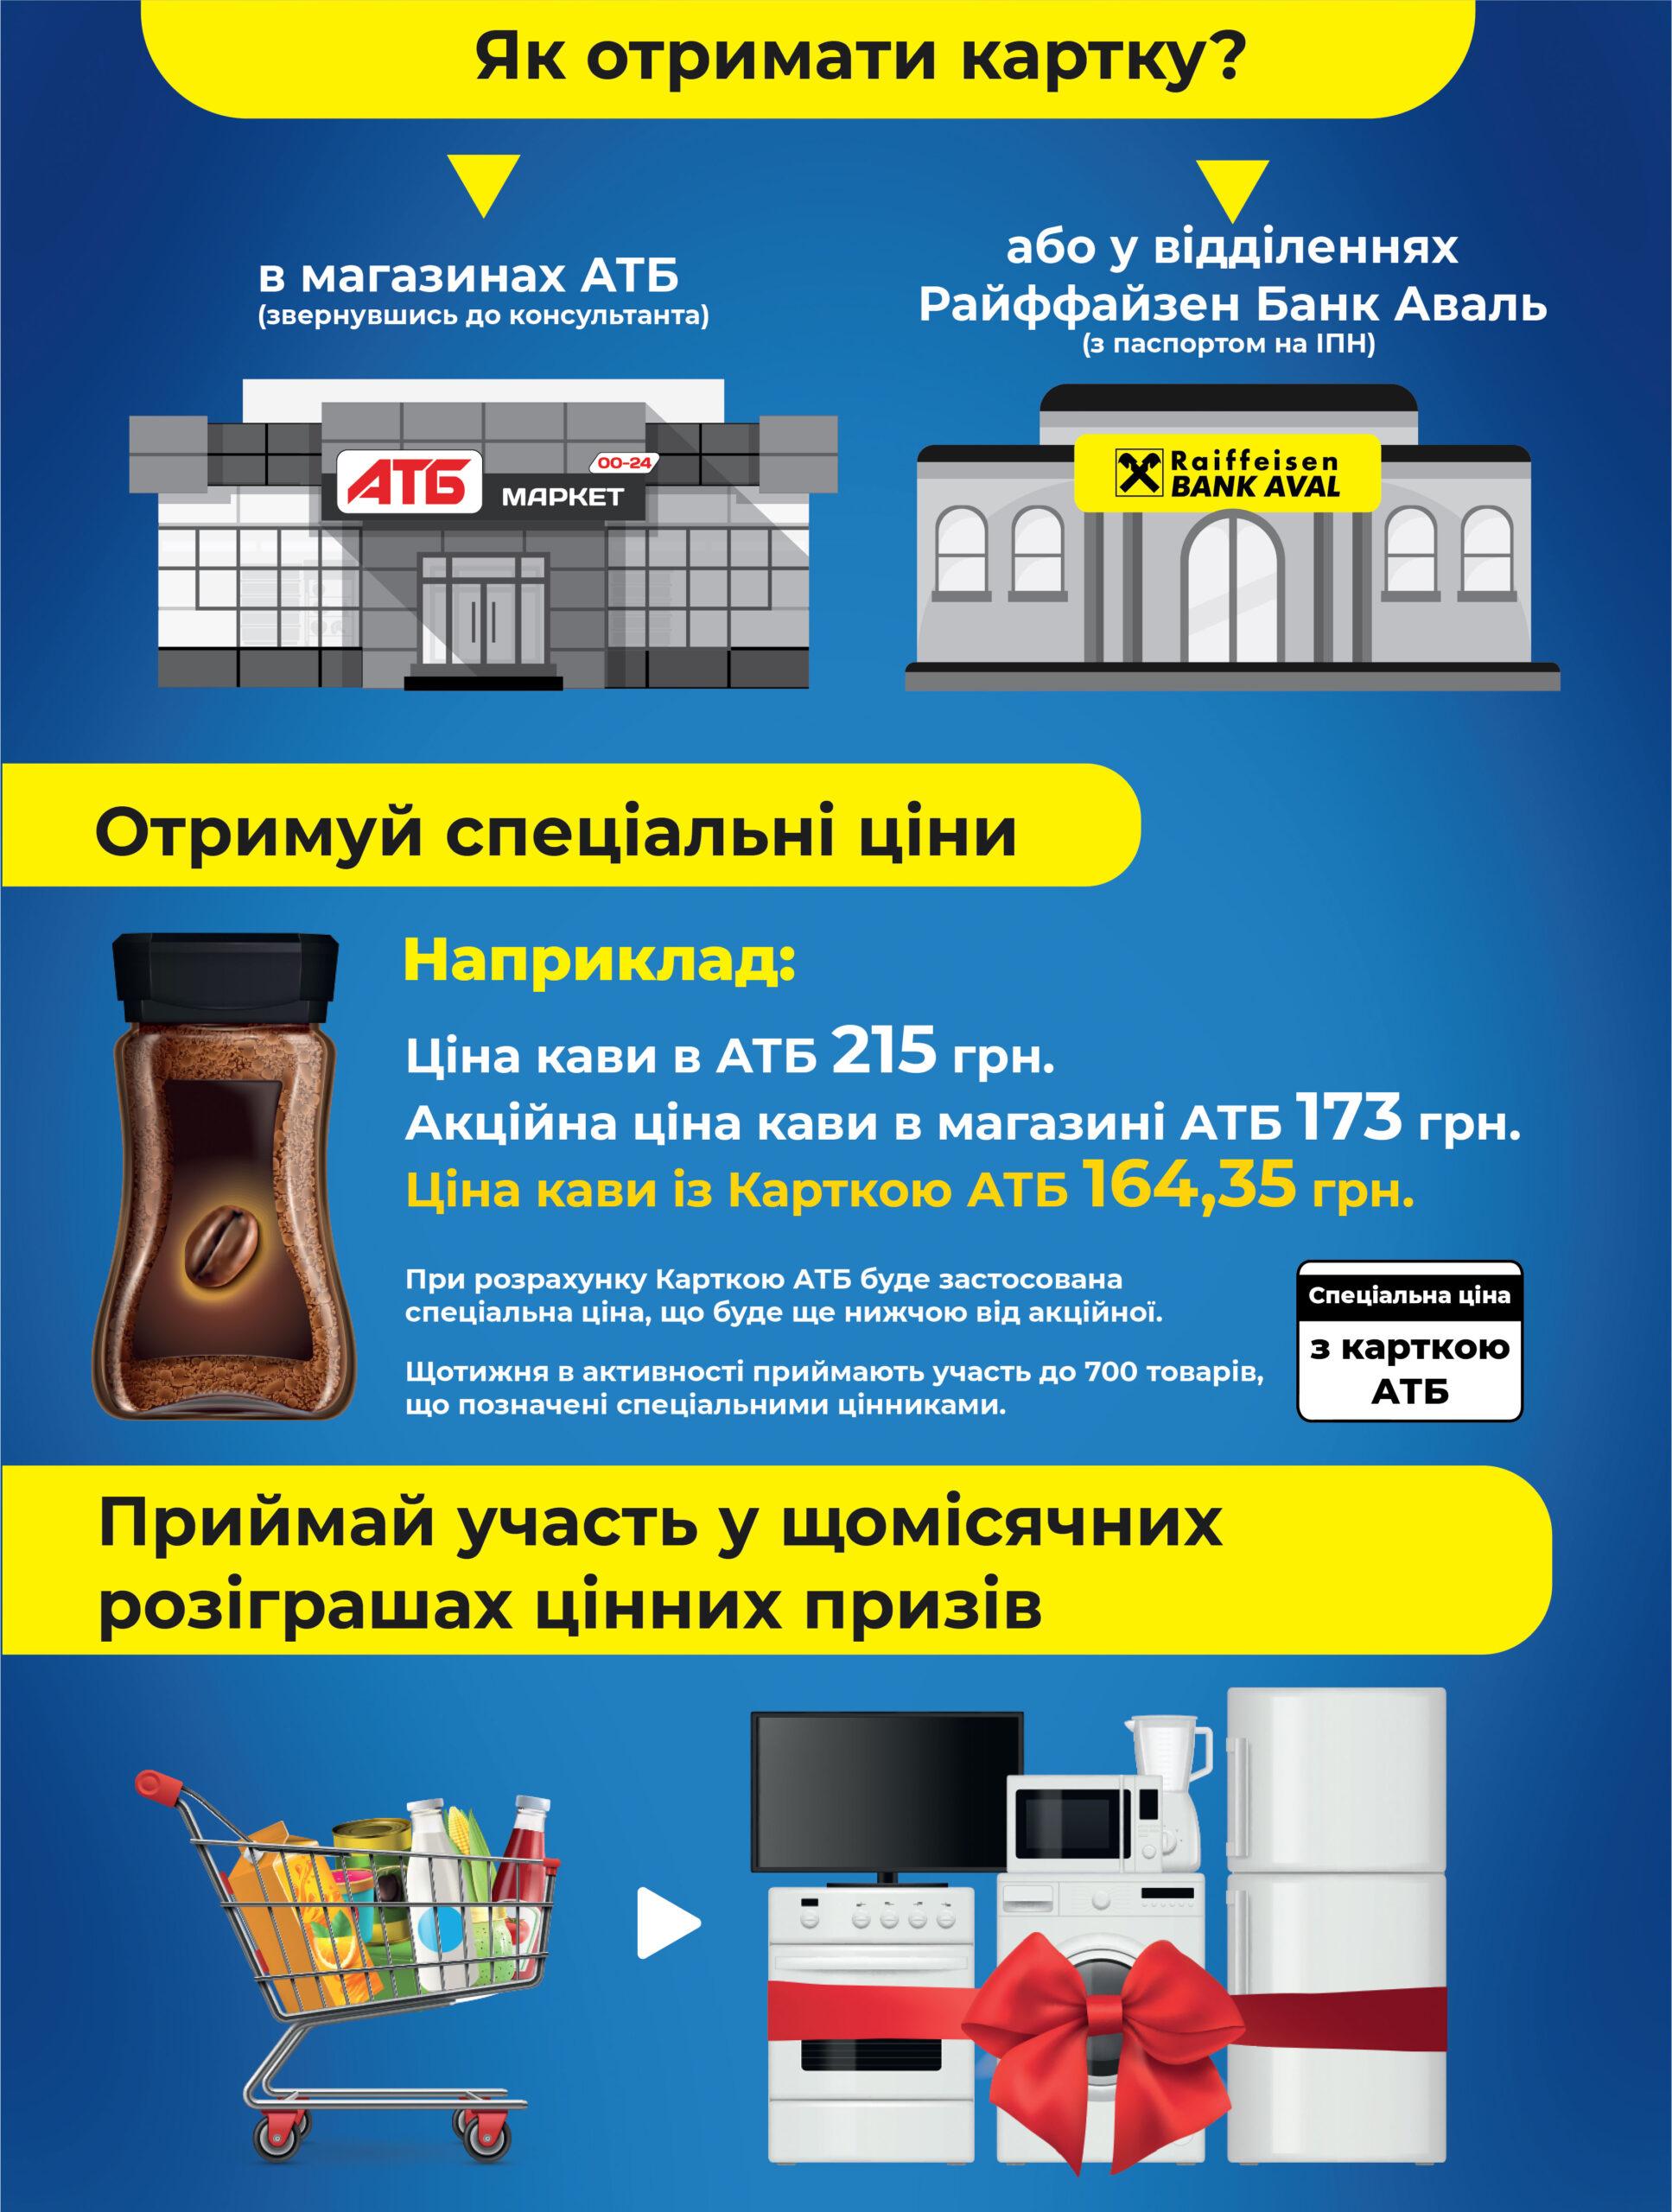 Банковская карта АТБ